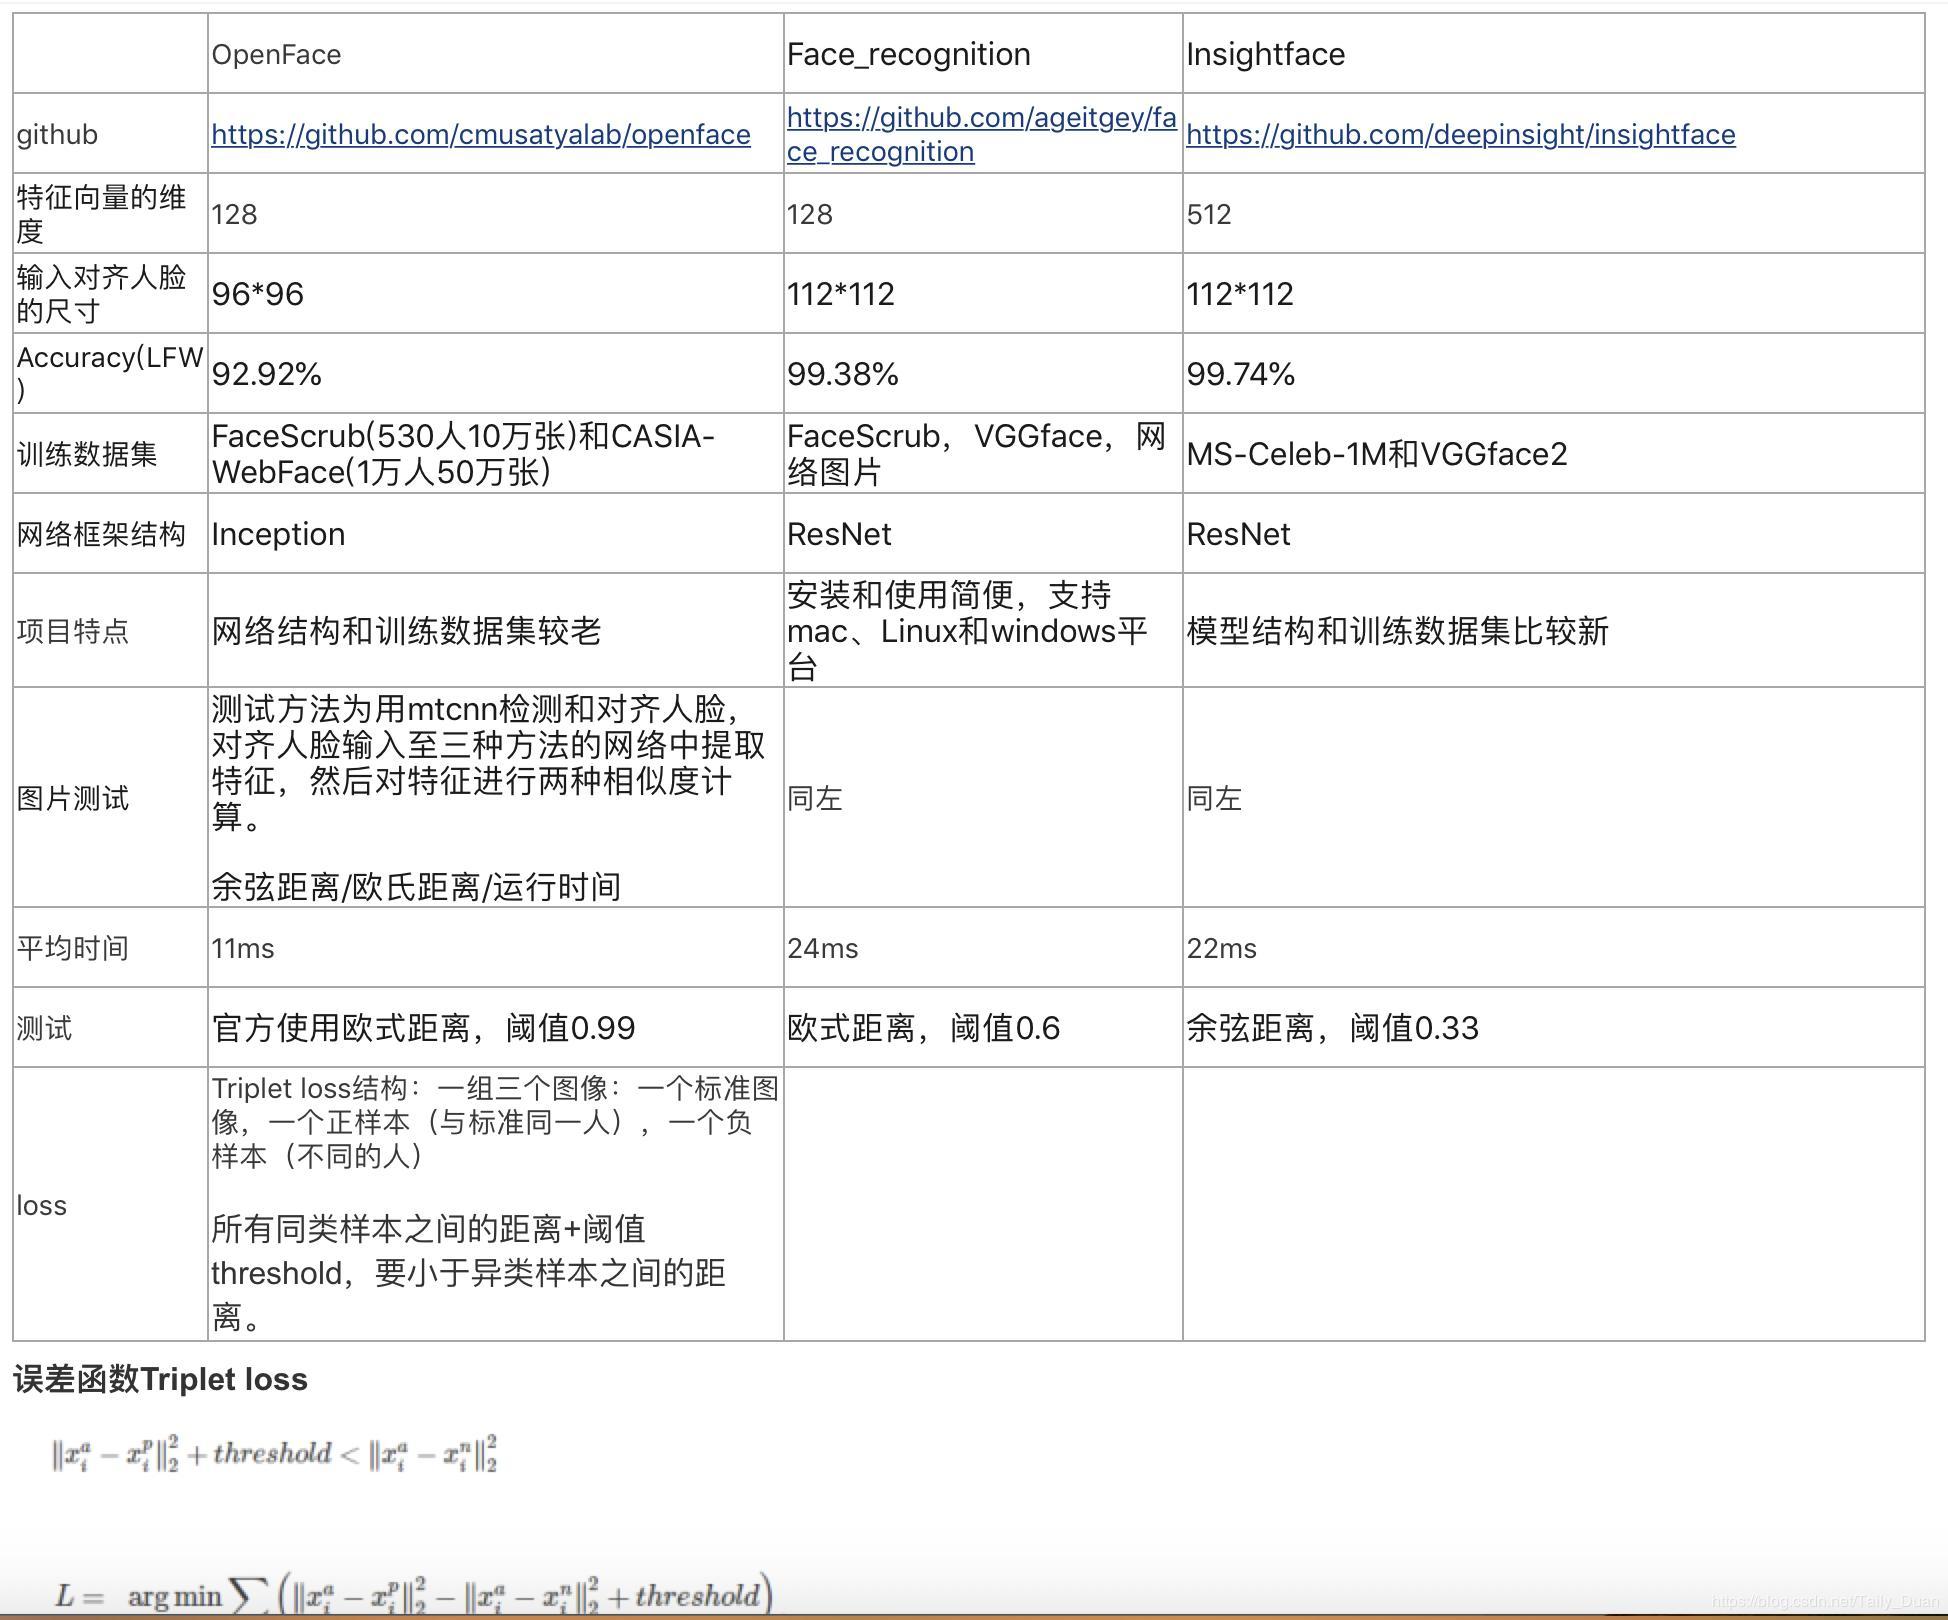 TensorFlow] Face recognition OpenFace, Face-recognition